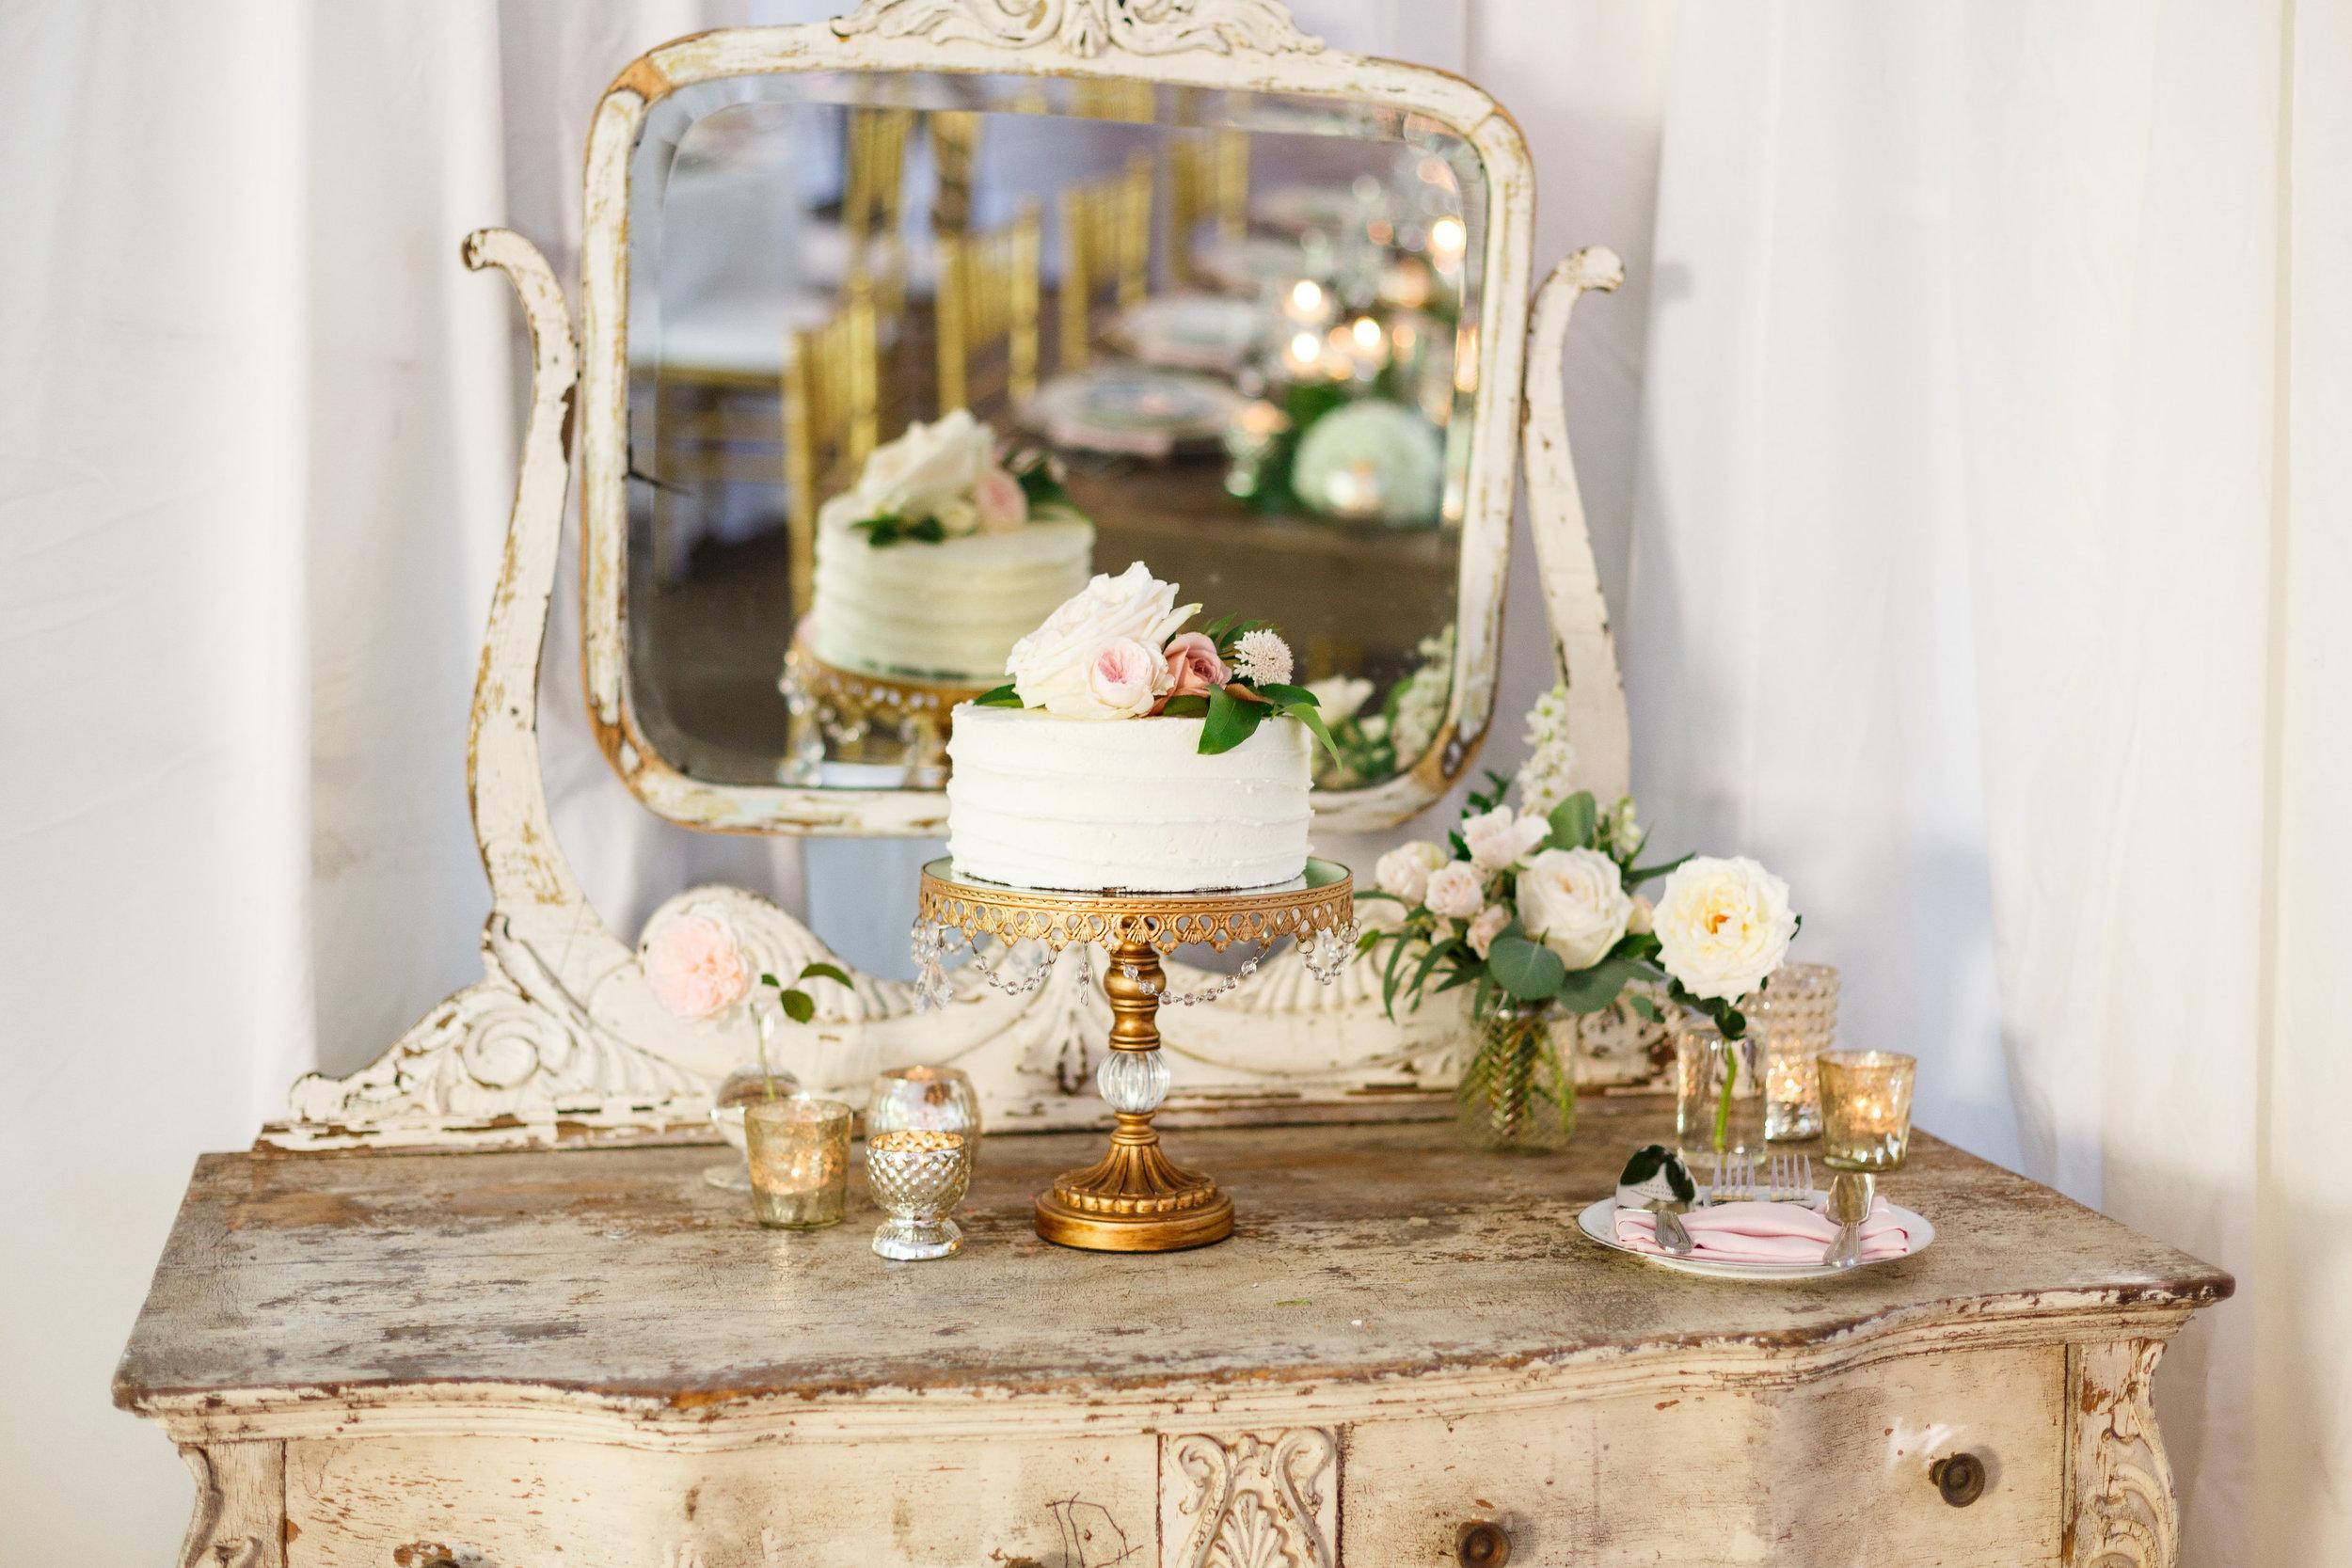 Cake Flowers.jpg